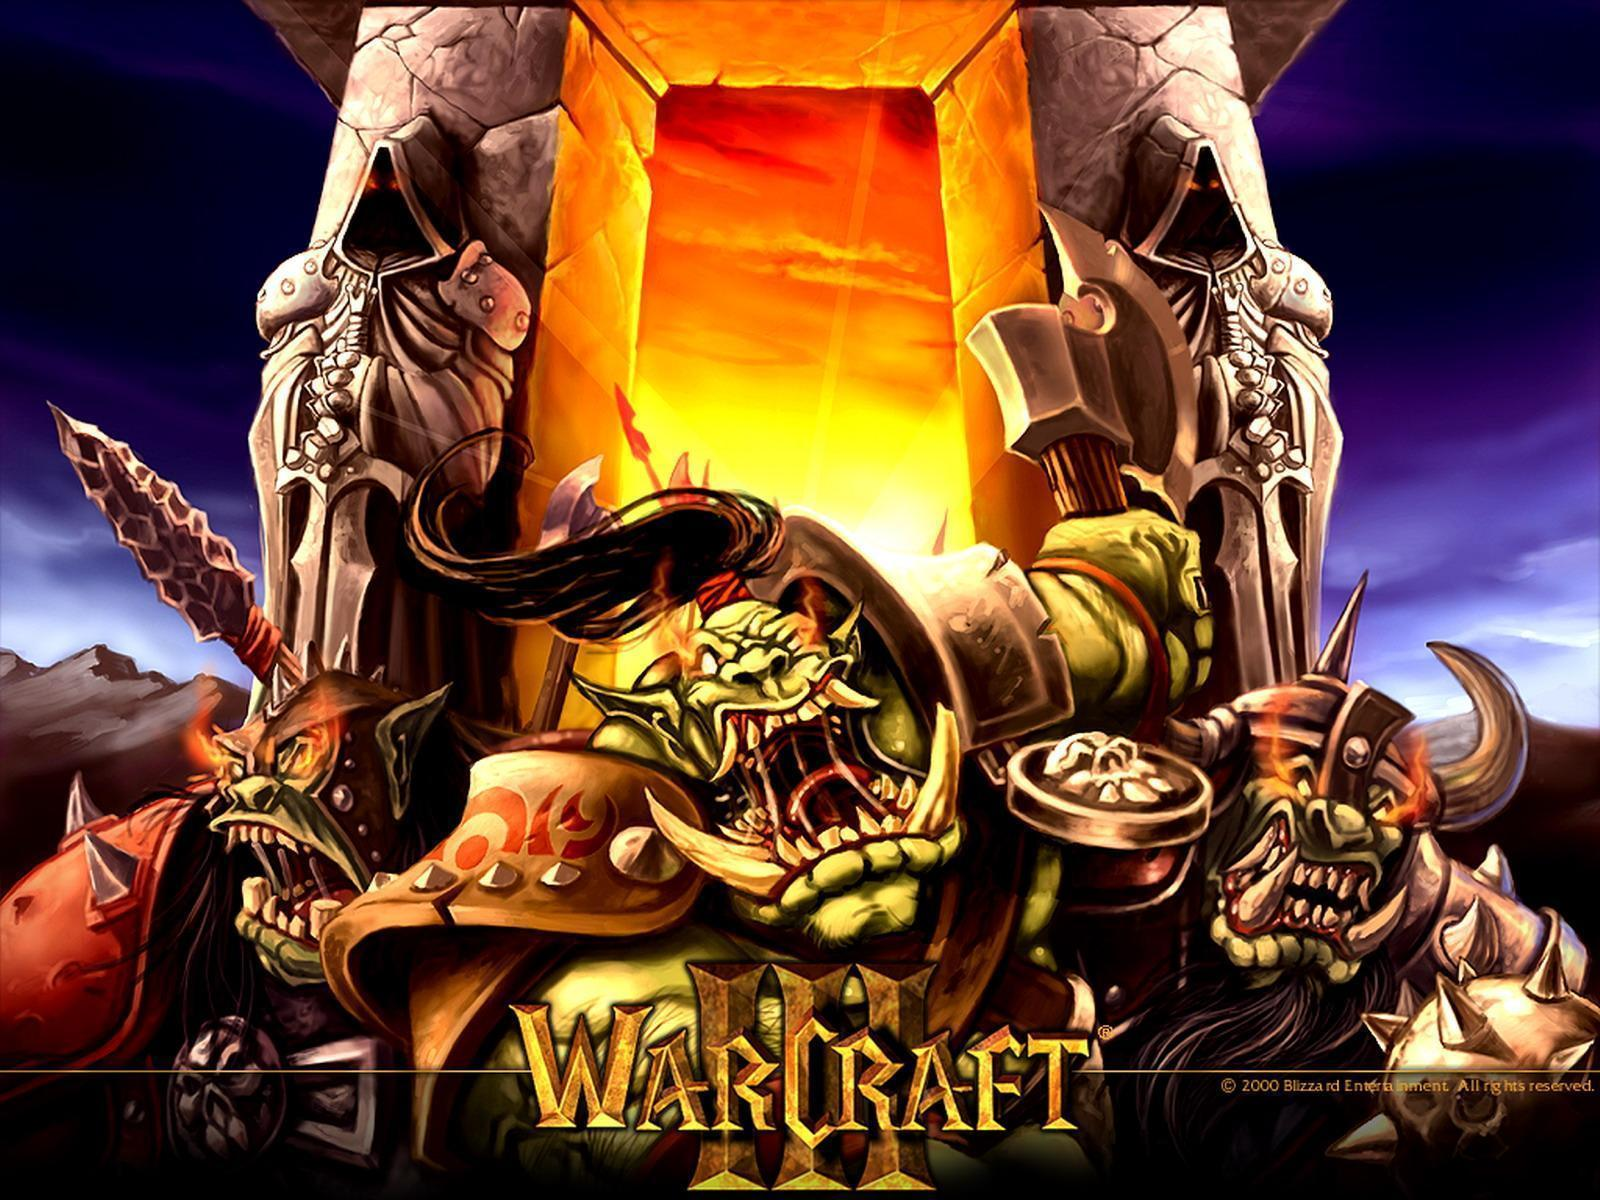 World Of Warcraft The Dark Portal Uhd 4k Wallpaper: Warcraft 3 Wallpapers